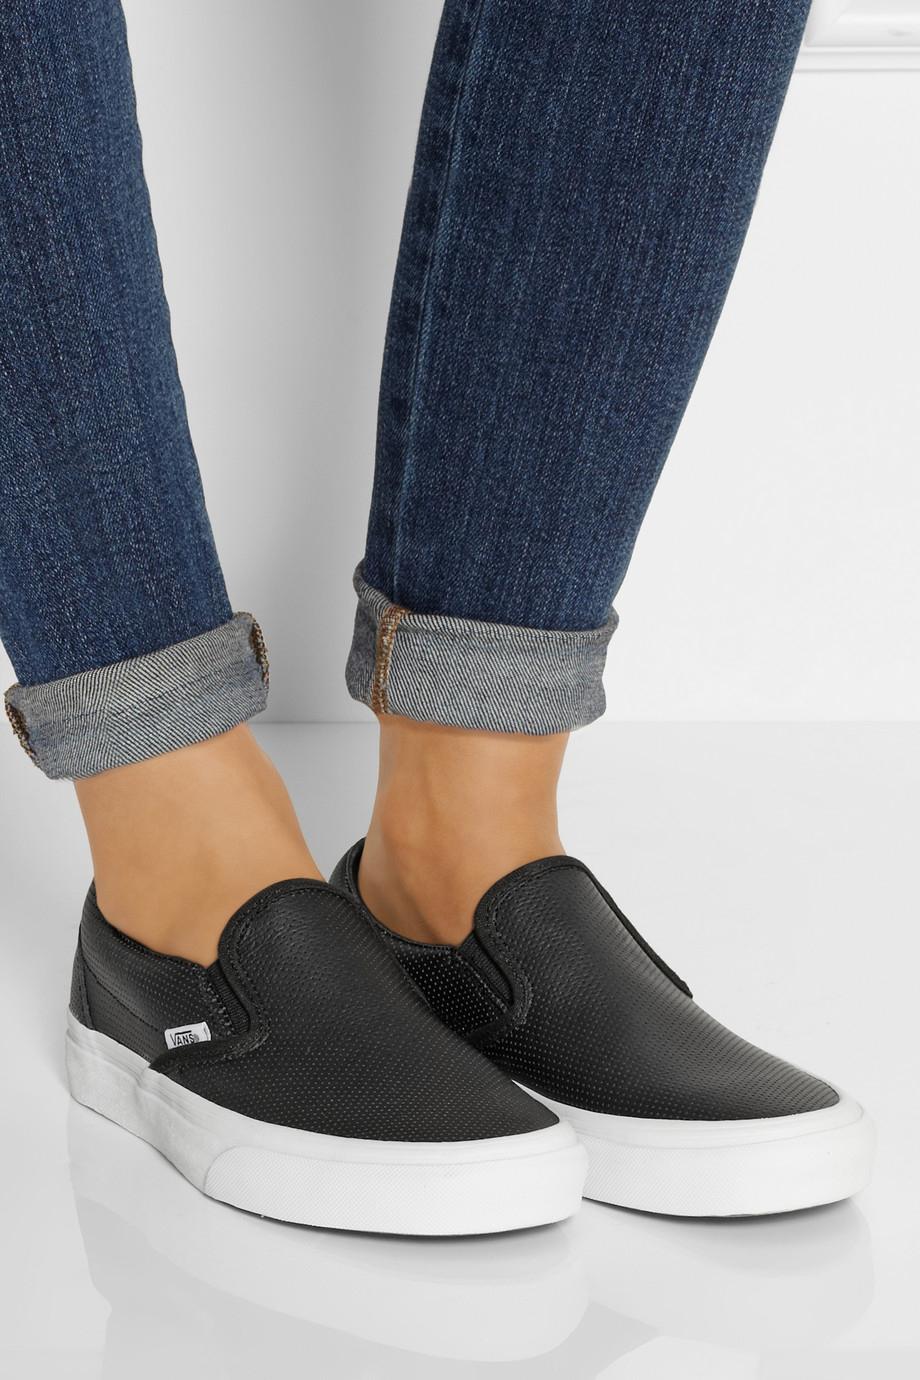 206b0ef7abf Lyst - Vans Perforated Leather Slip-On Sneakers in Black